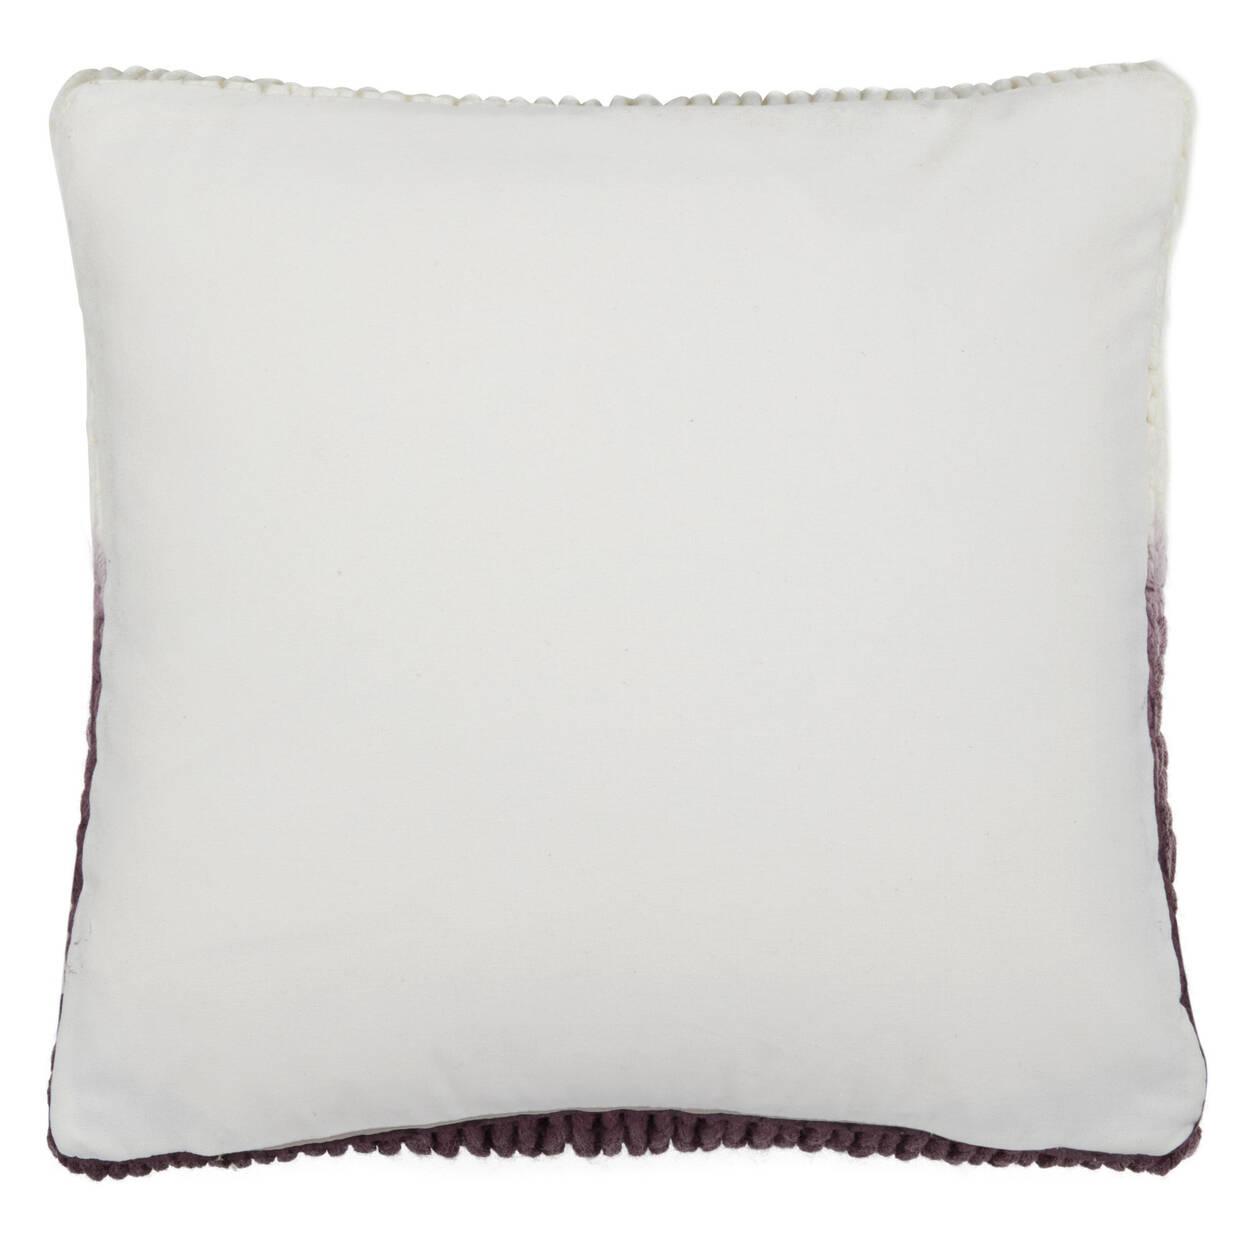 "Sigi Knitted Decorative Ombré Pillow 17"" X 17"""